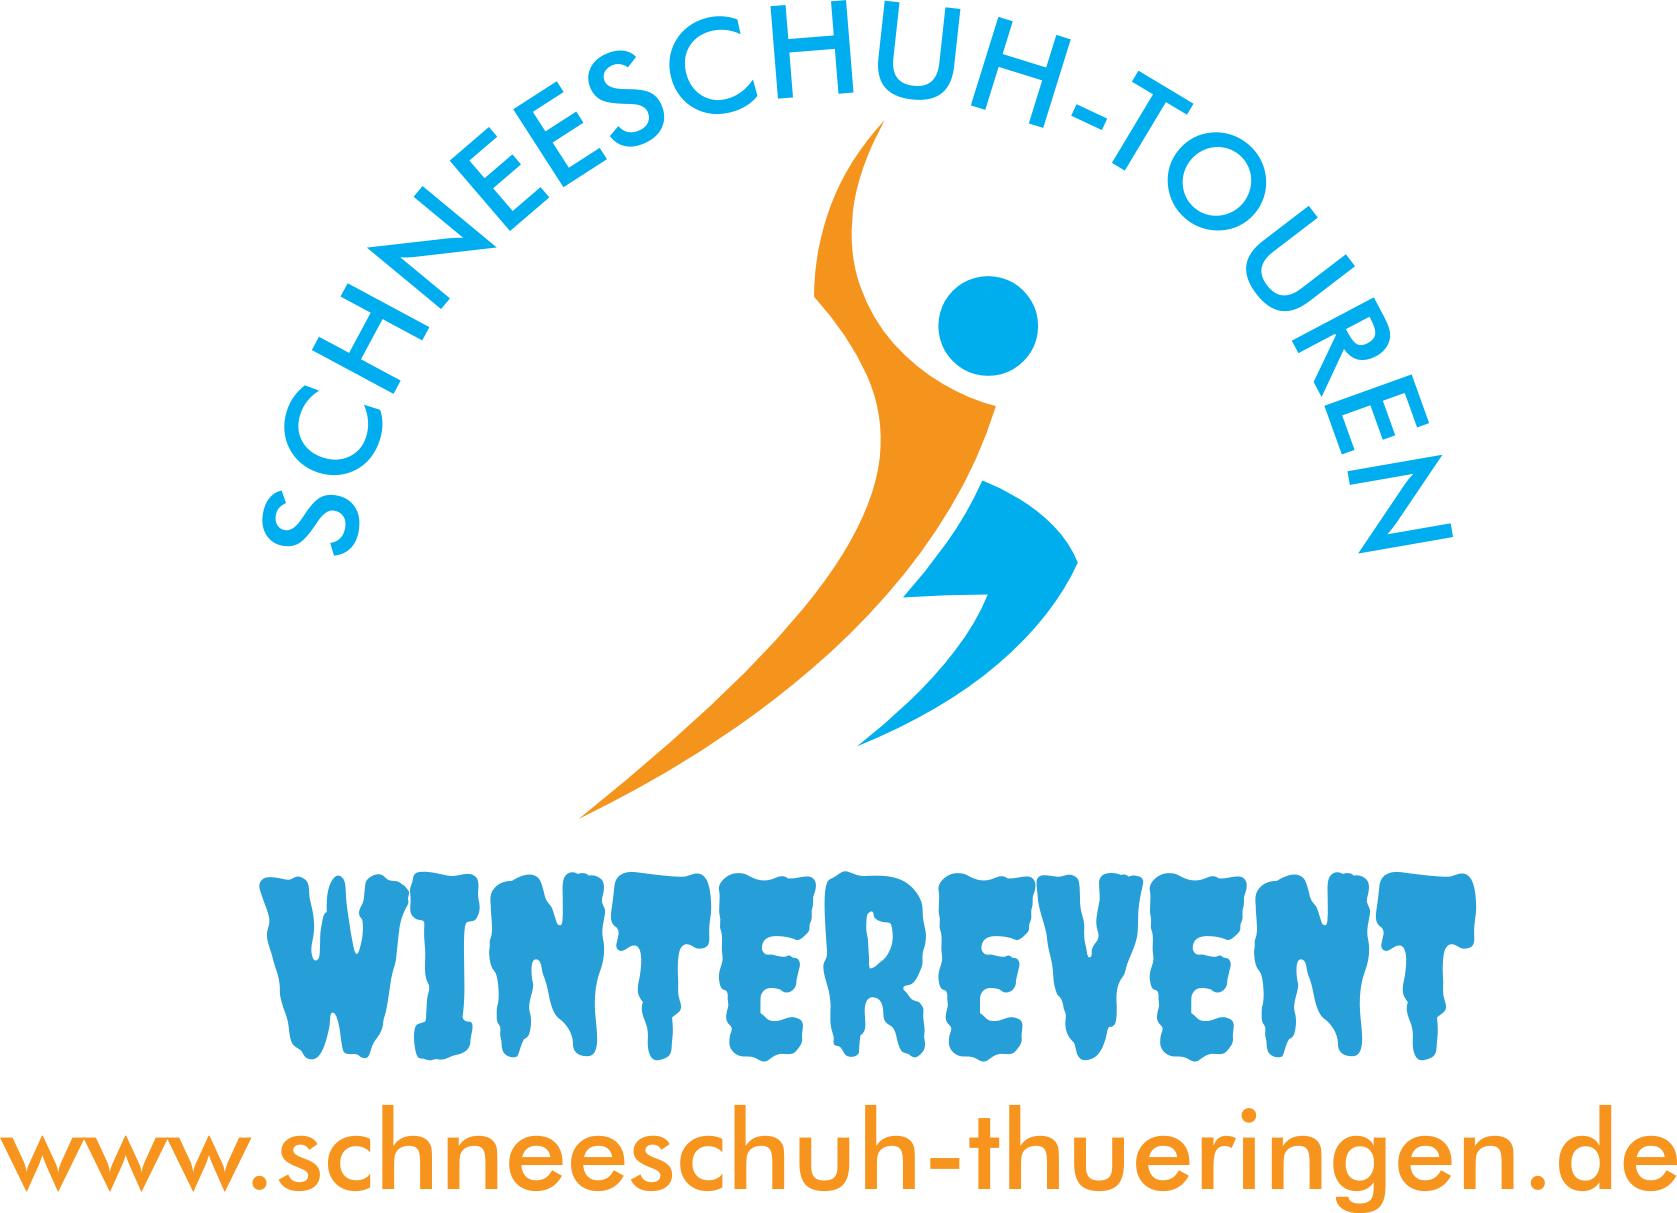 Schneeschuh-Thueringen.de